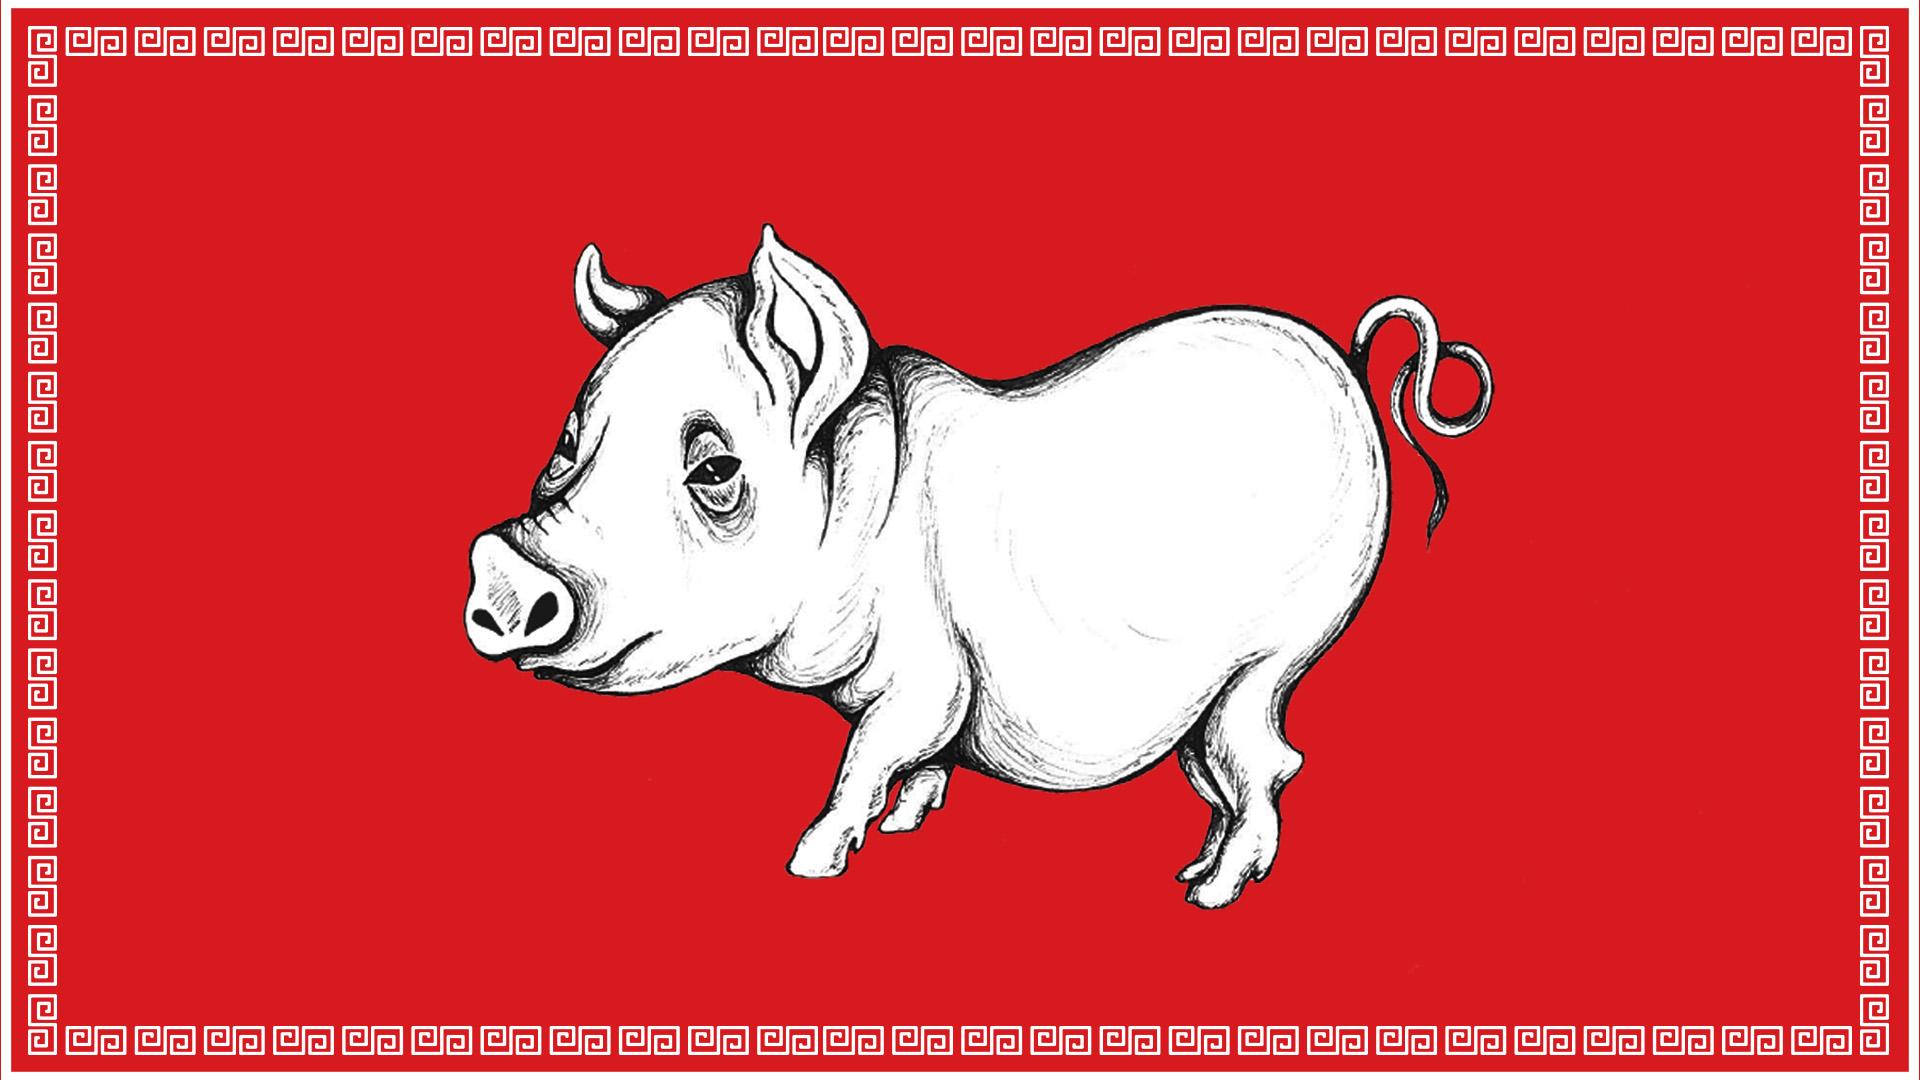 pig chinese zodiac